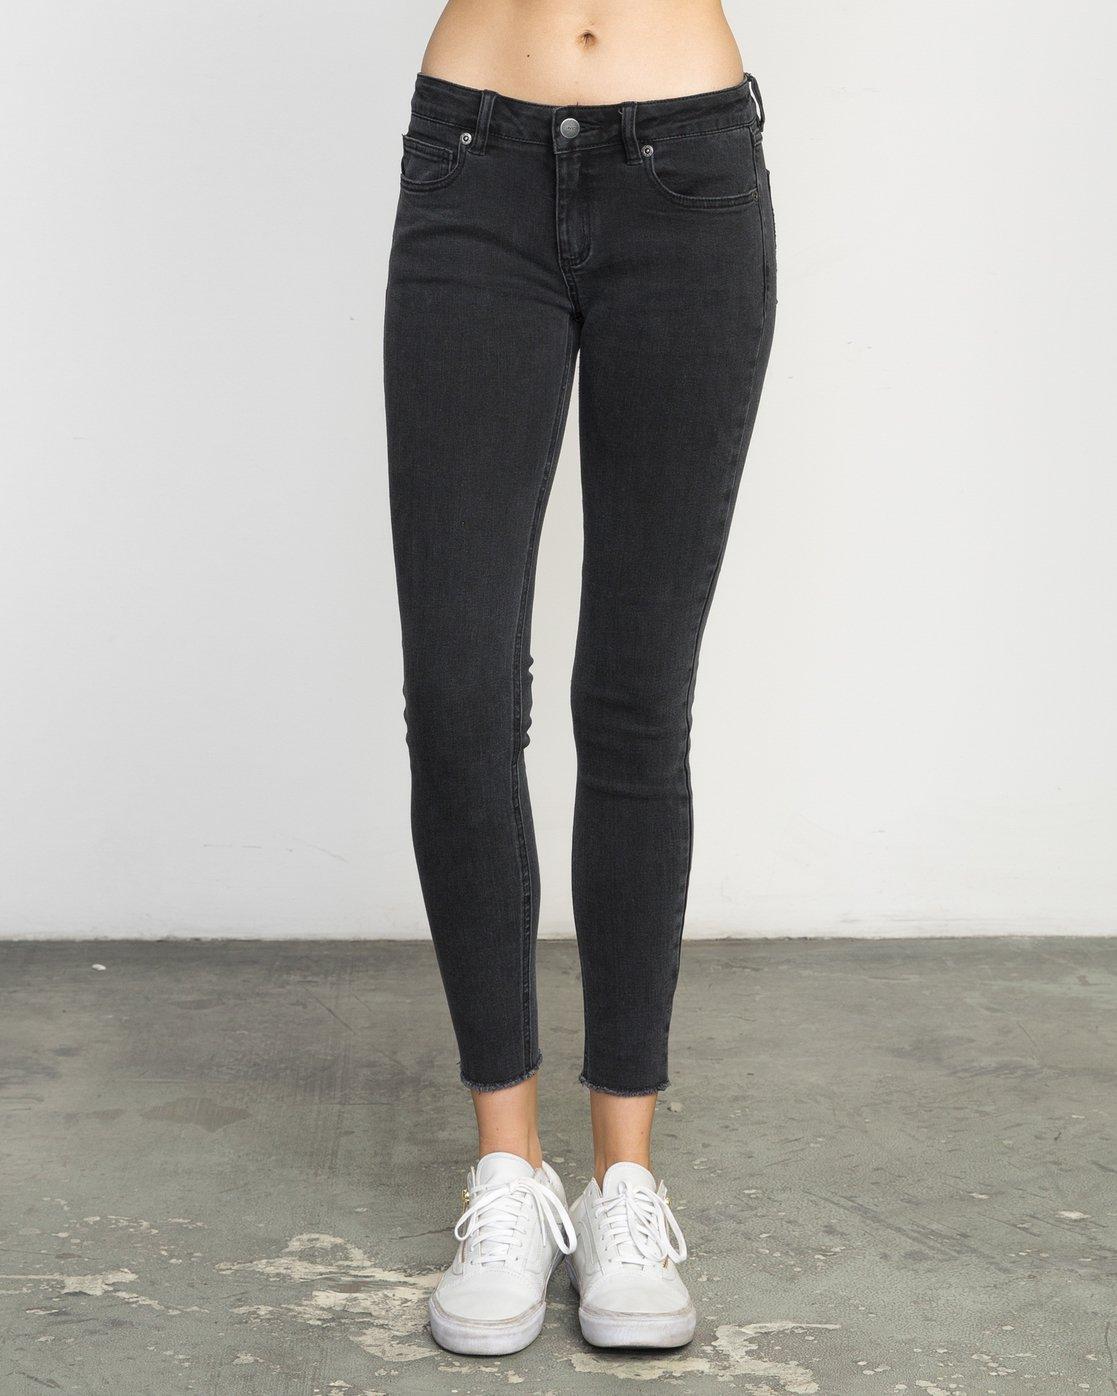 0 Dayley Mid Rise Denim Jeans  WCDP02DA RVCA